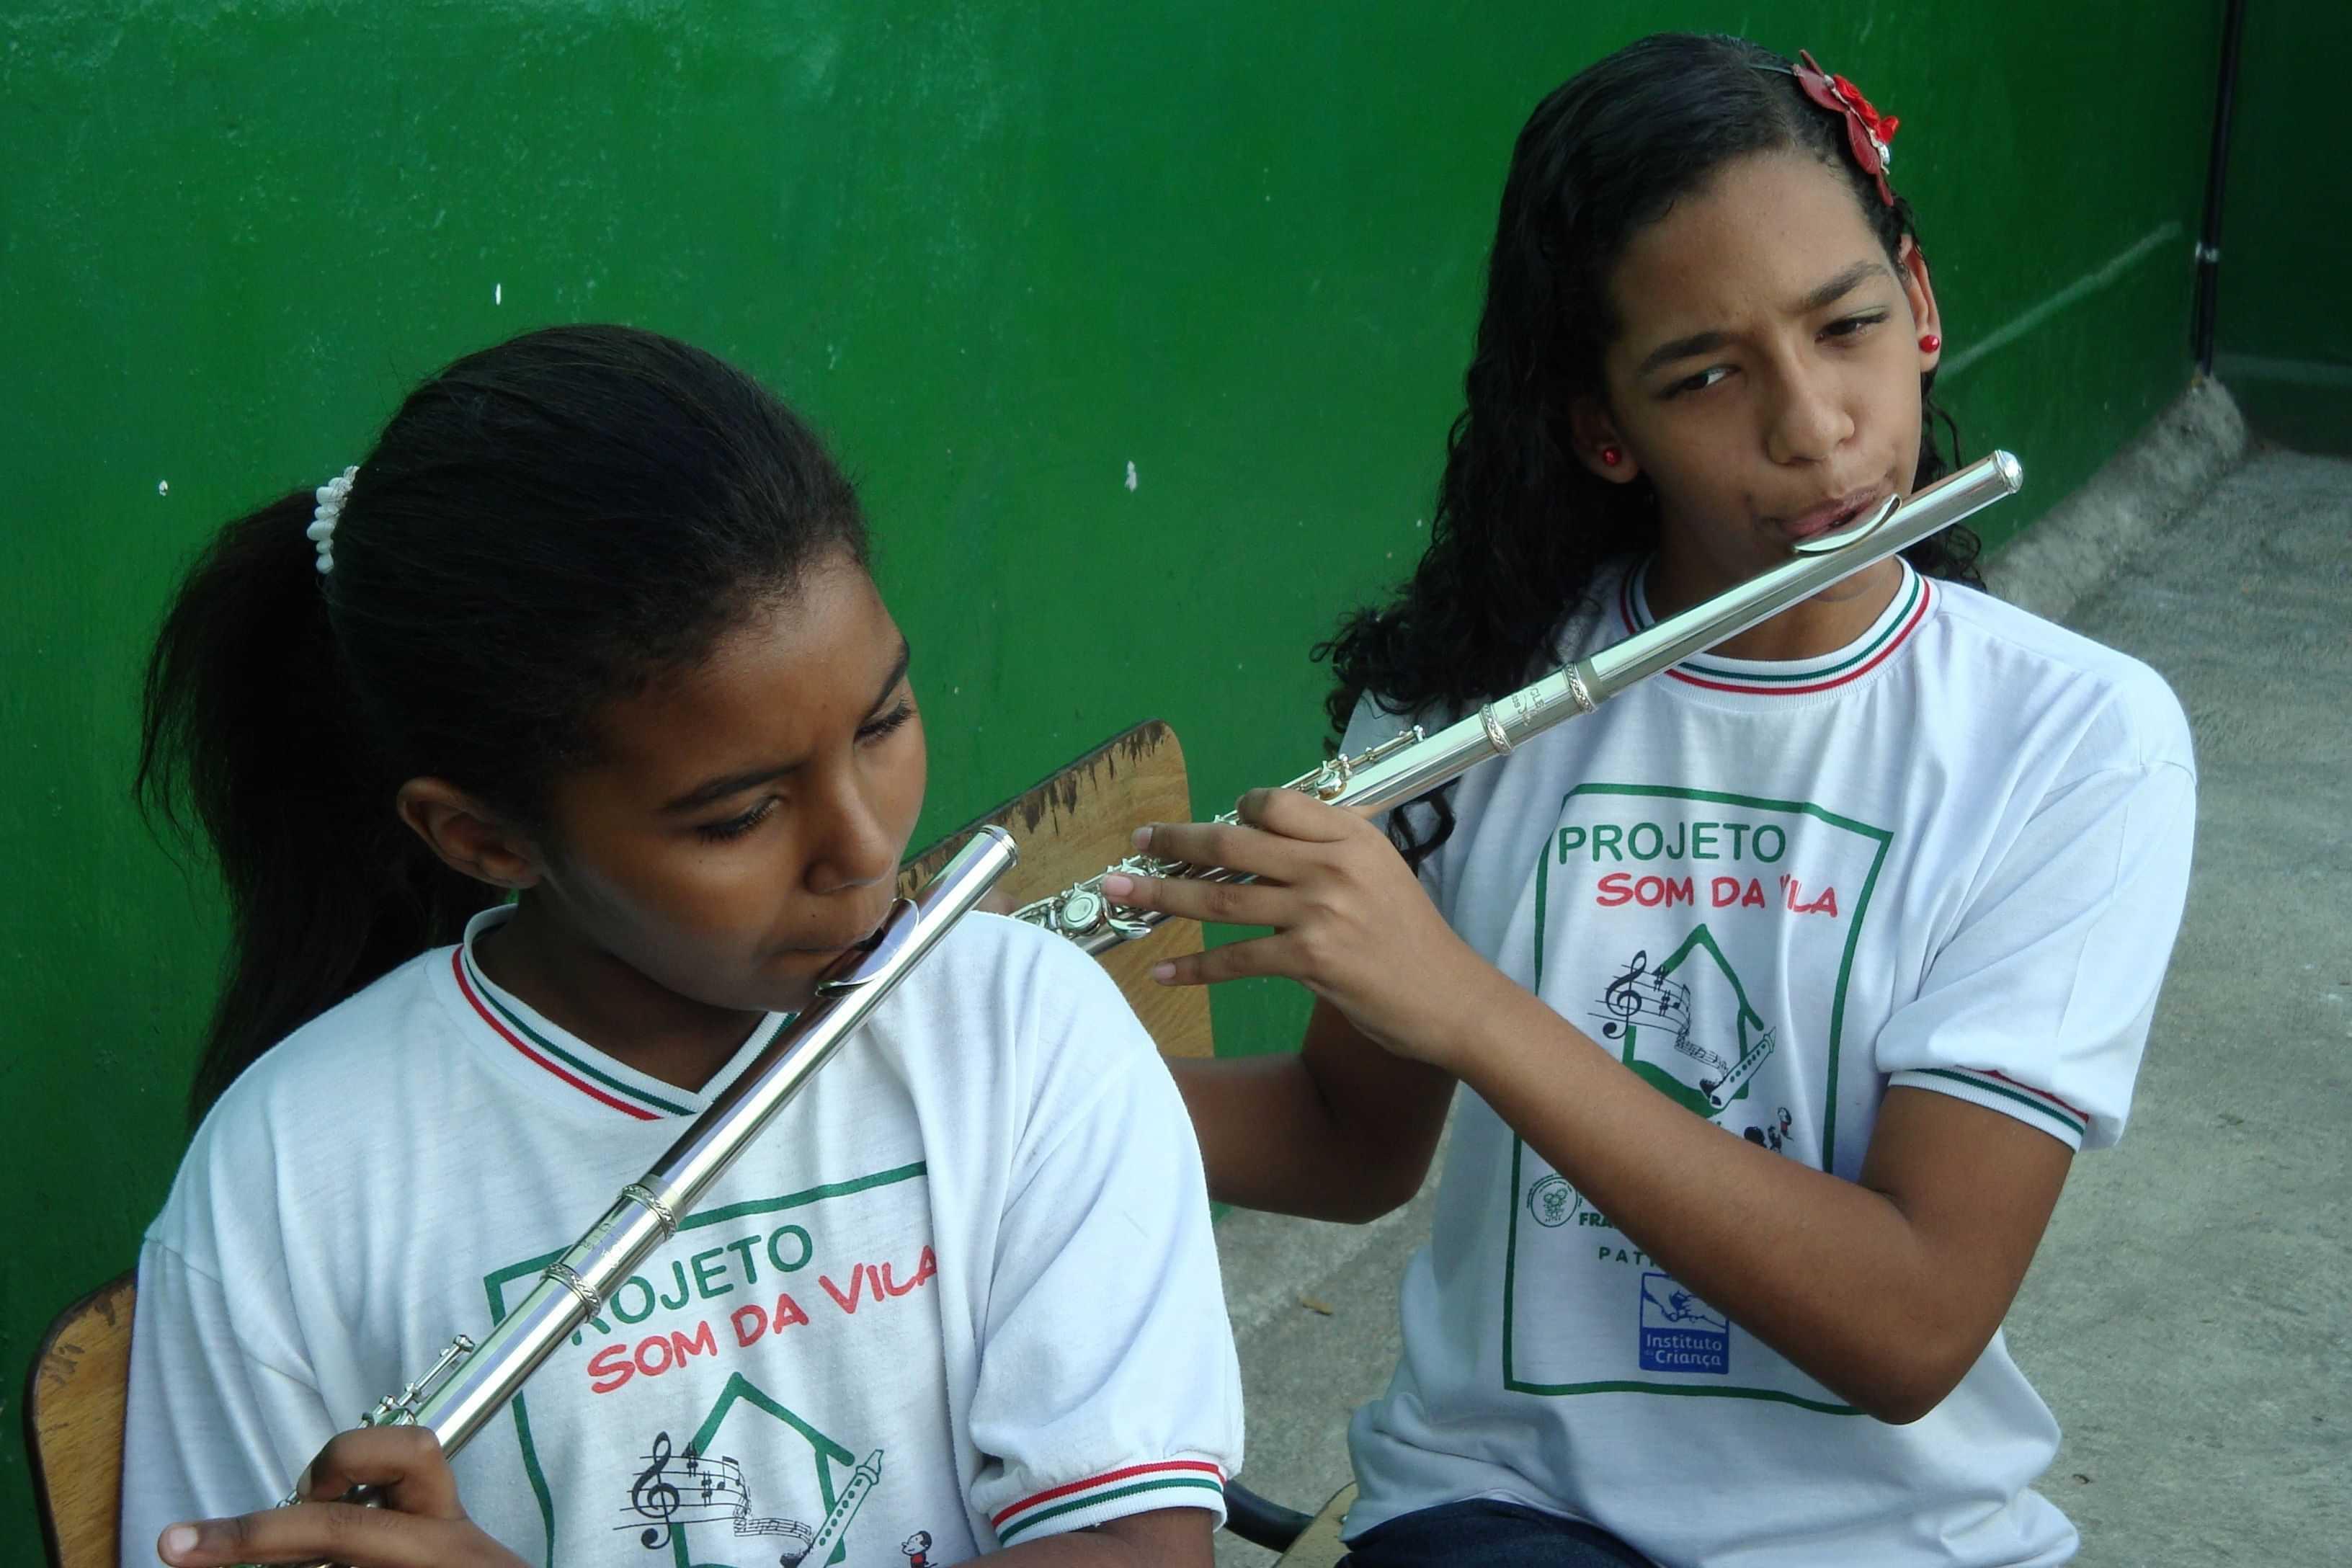 Assoc Educ Francisca Nubiana Da Silva - foto 28